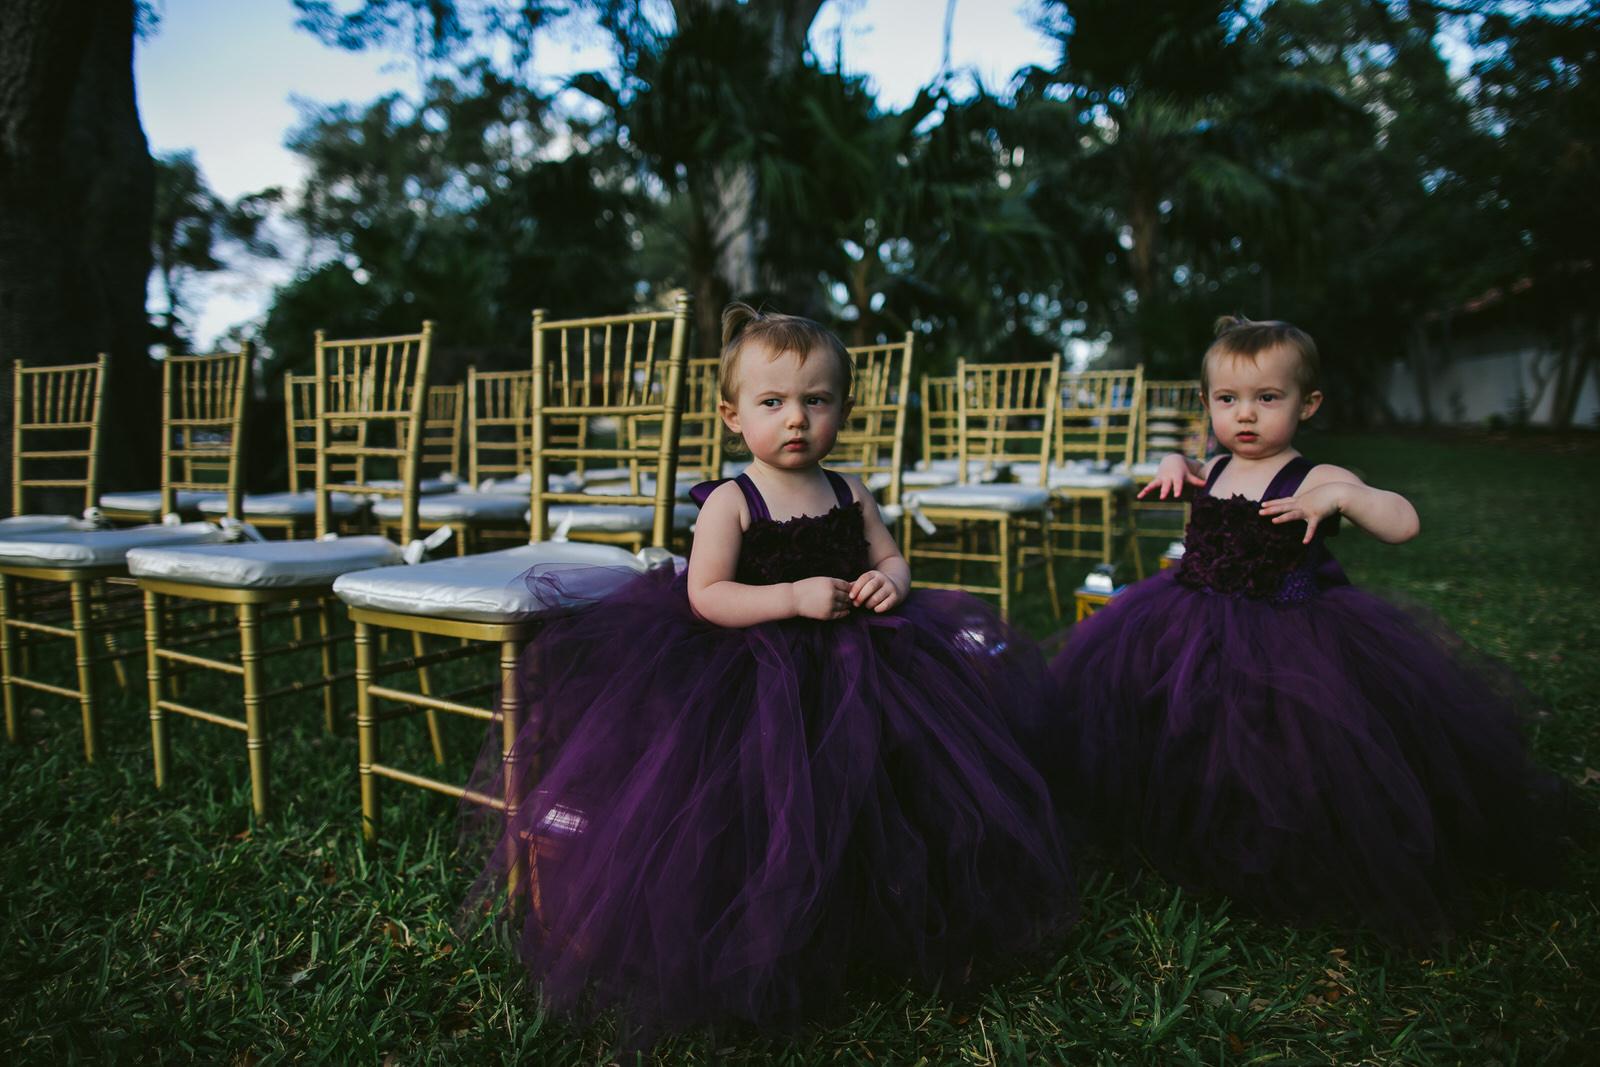 fort_lauderdale_wedding_portraits_ceremony_andrea_casey-117.jpg